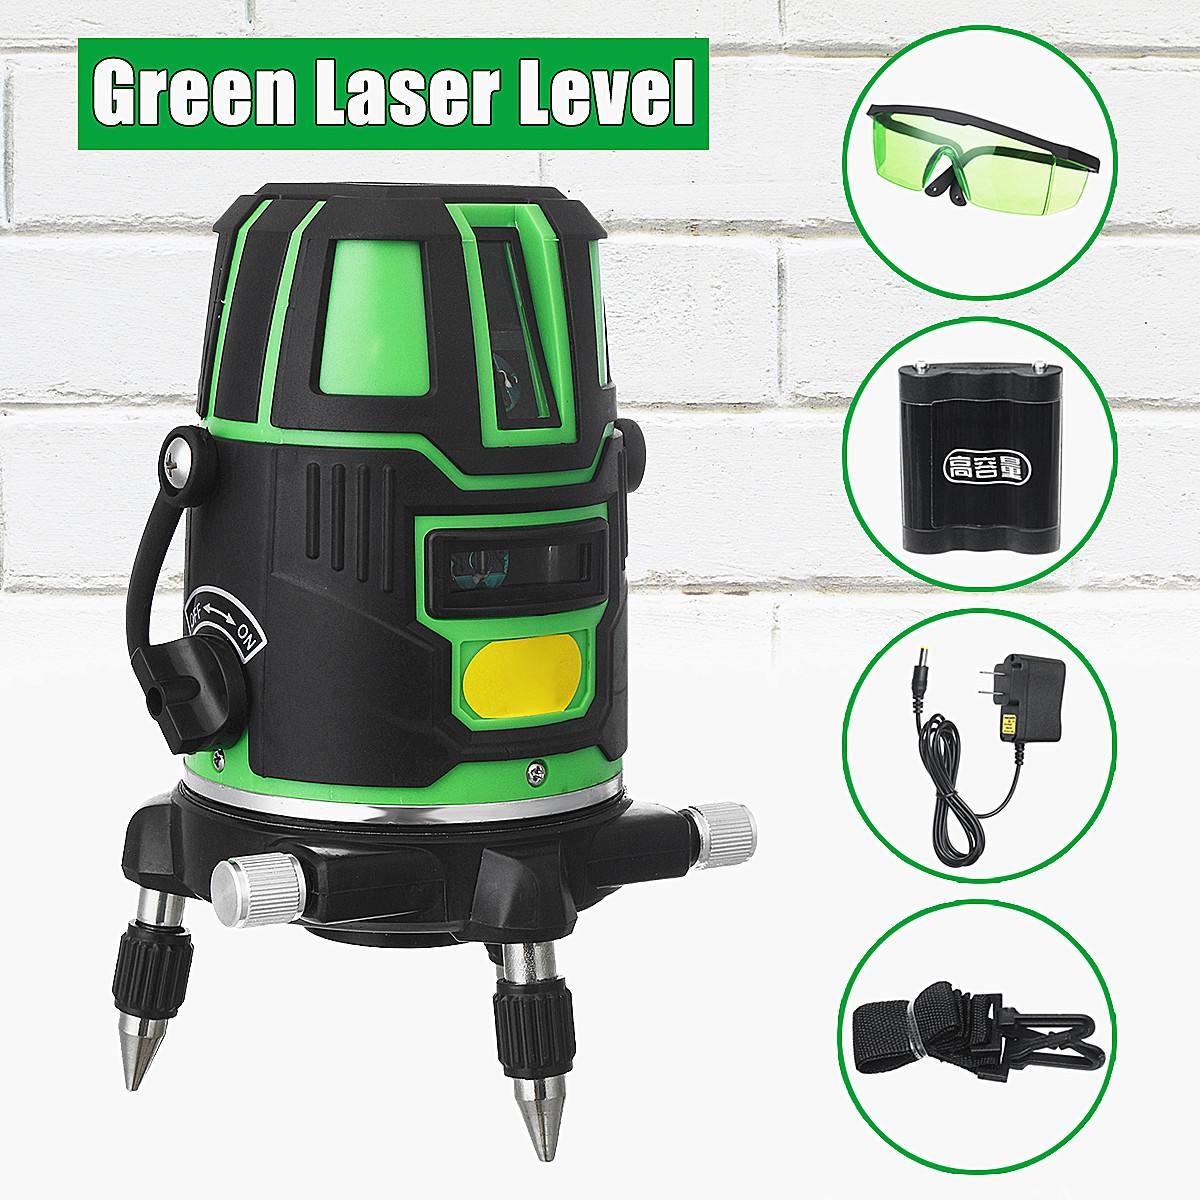 Laser Level 2 Line Green Cross Line Self Leveling 360C Rotation Measure ToolLaser Level 2 Line Green Cross Line Self Leveling 360C Rotation Measure Tool